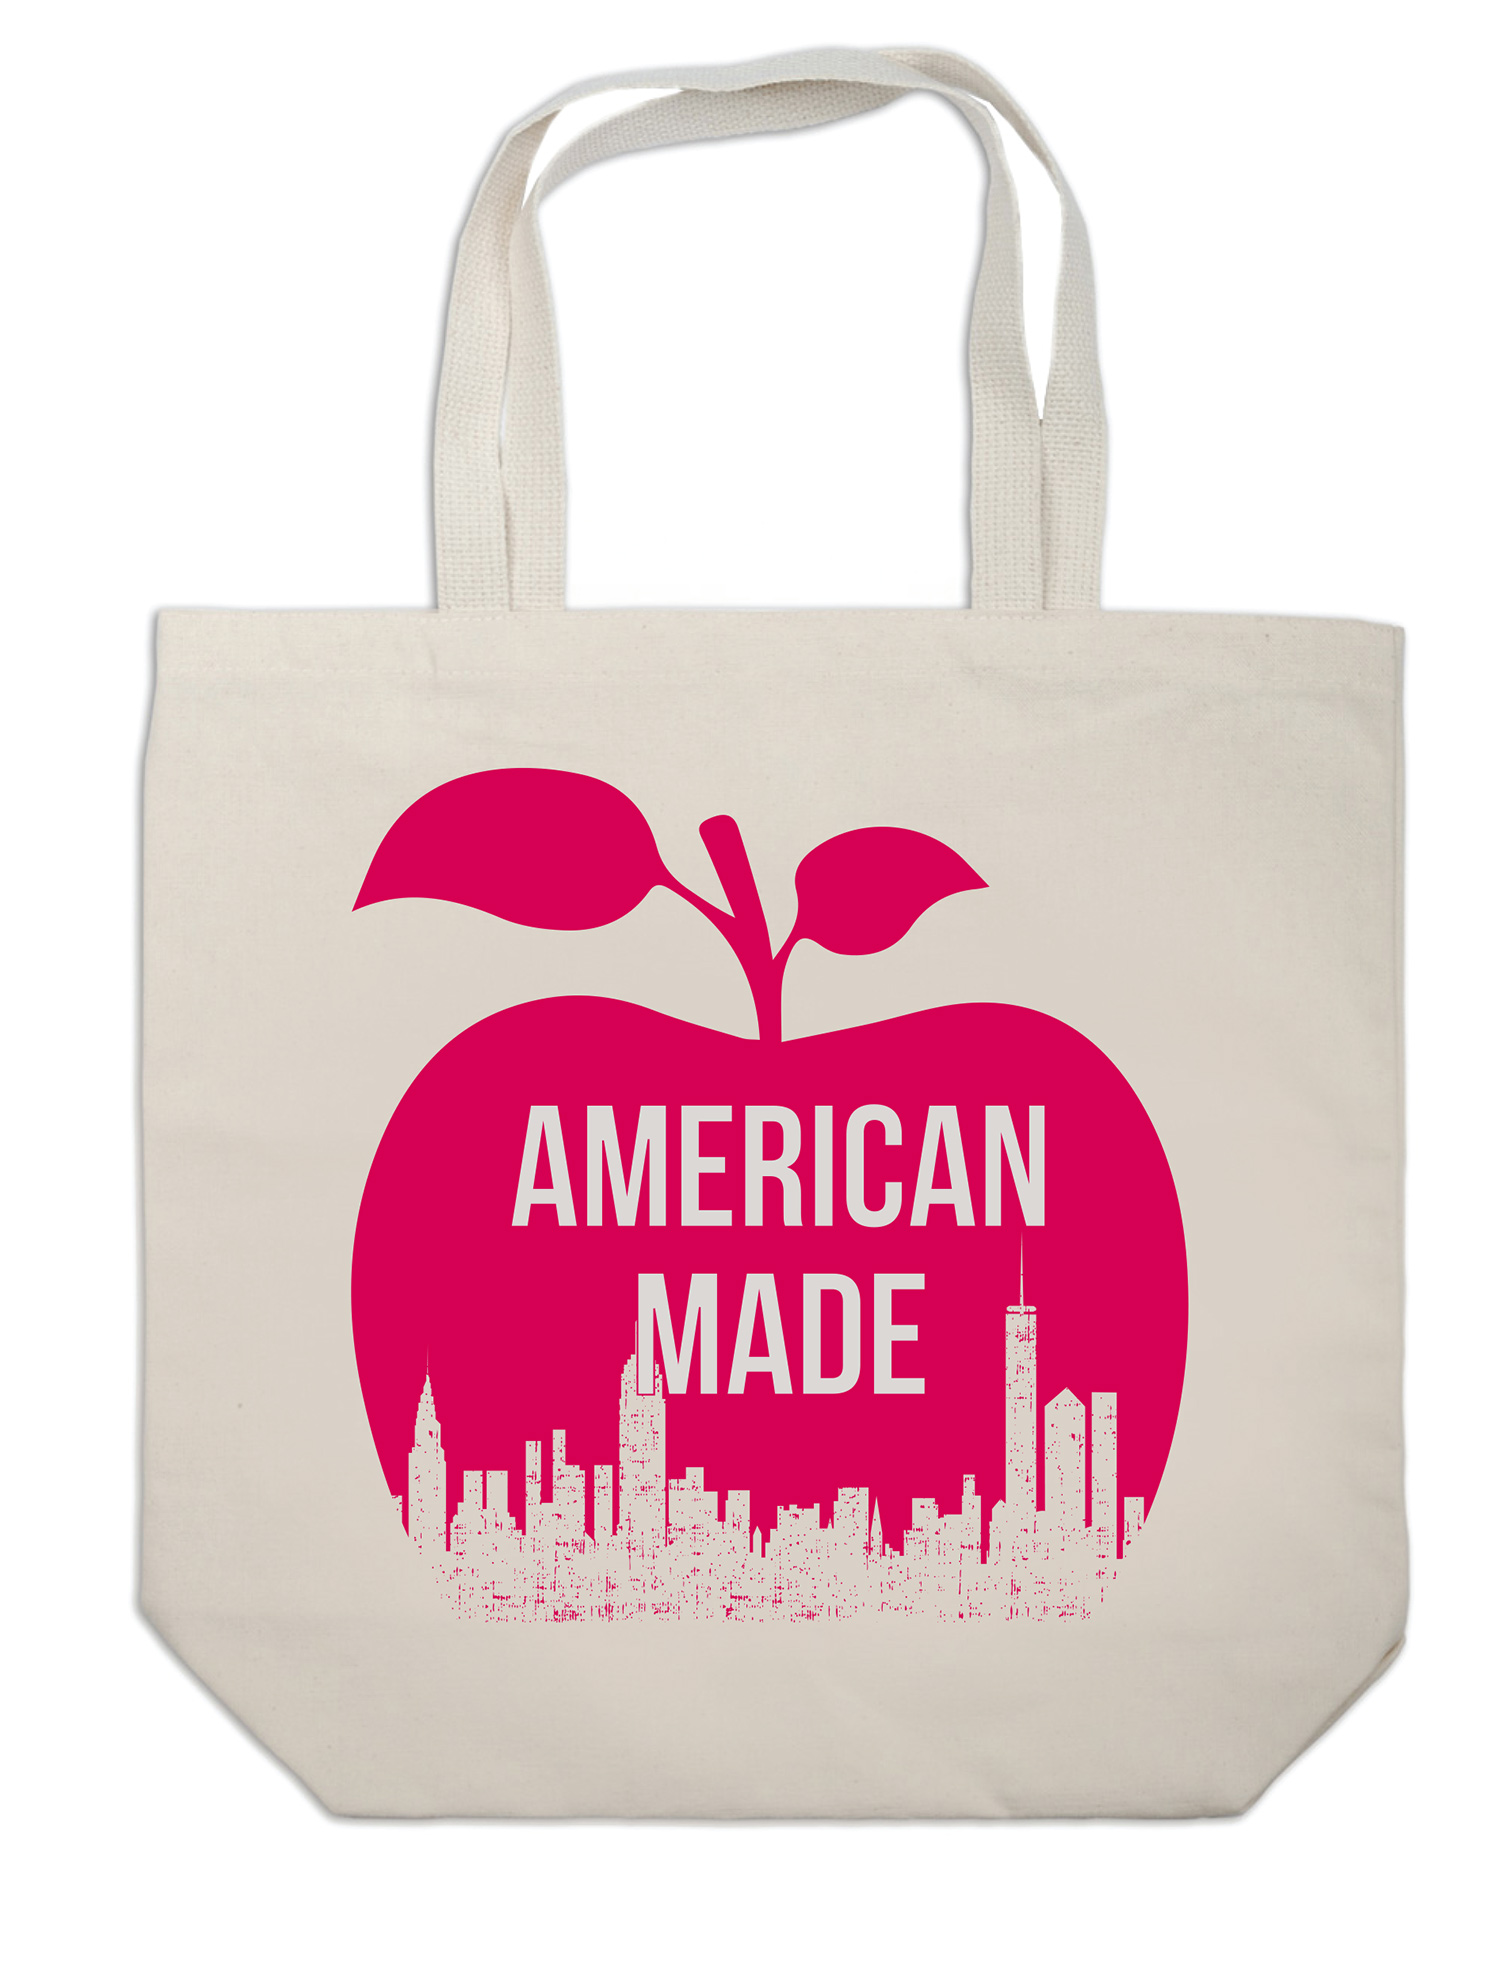 american-made-tote-bags.jpg